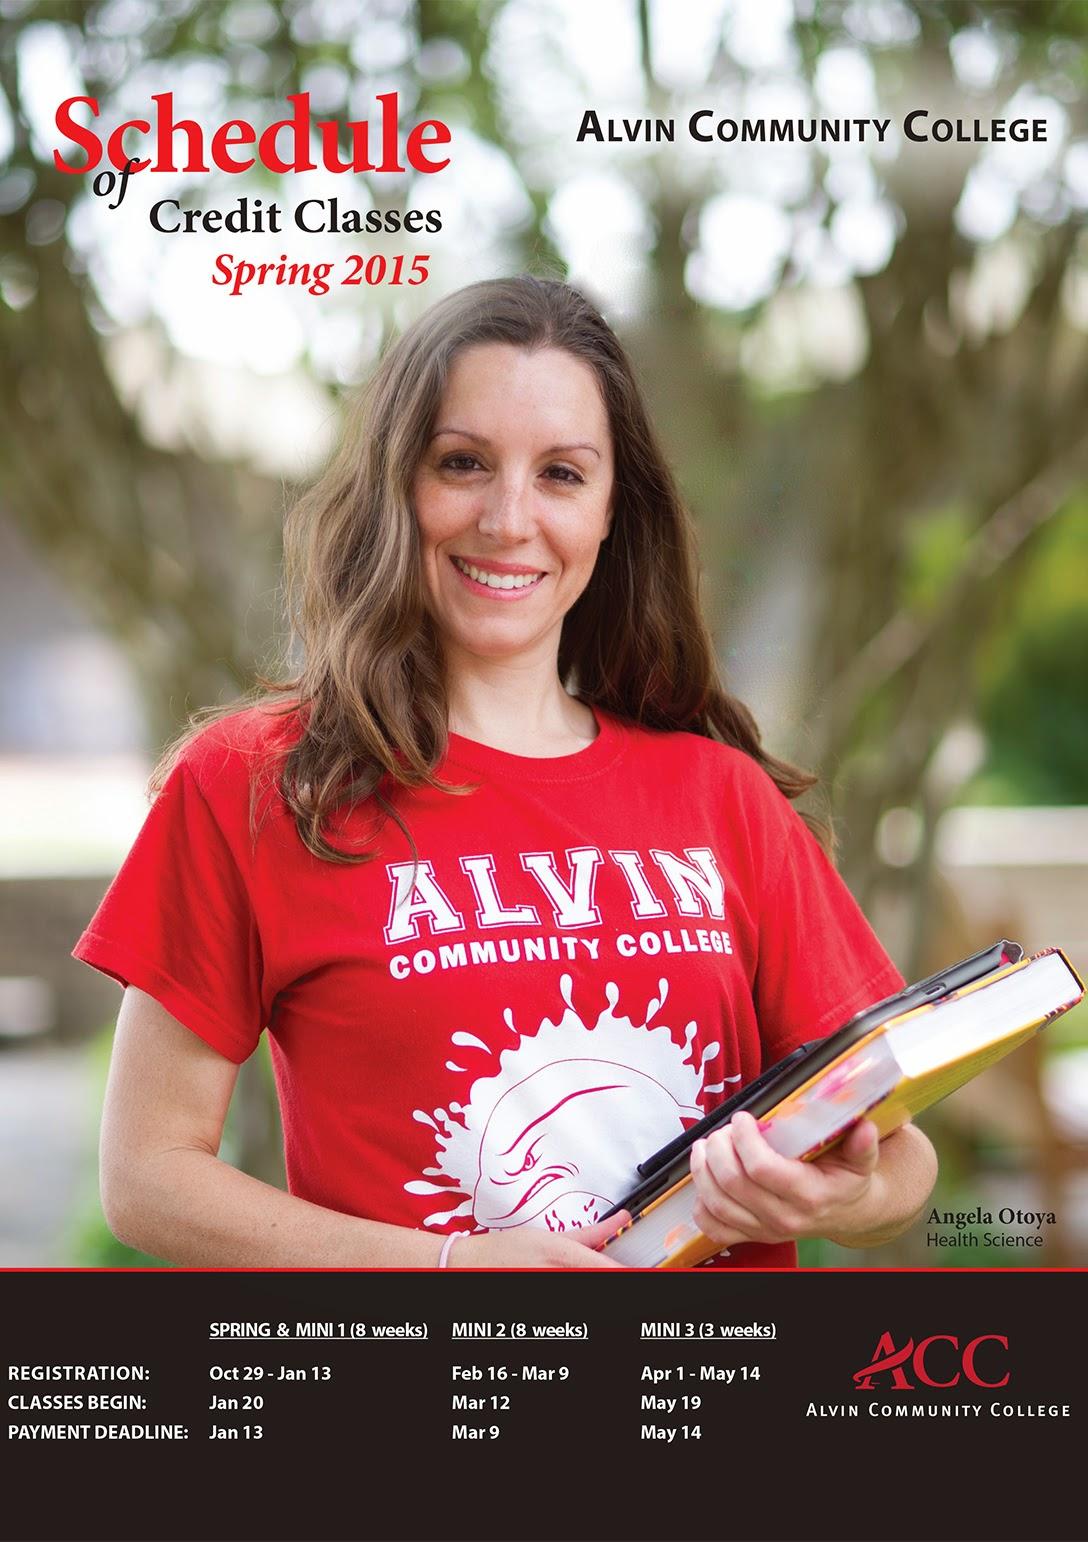 http://www.alvincollege.edu/Portals/0/schedules/pdfs/ACC%20Spring%202015%20Credit%20Schedule_Web.pdf